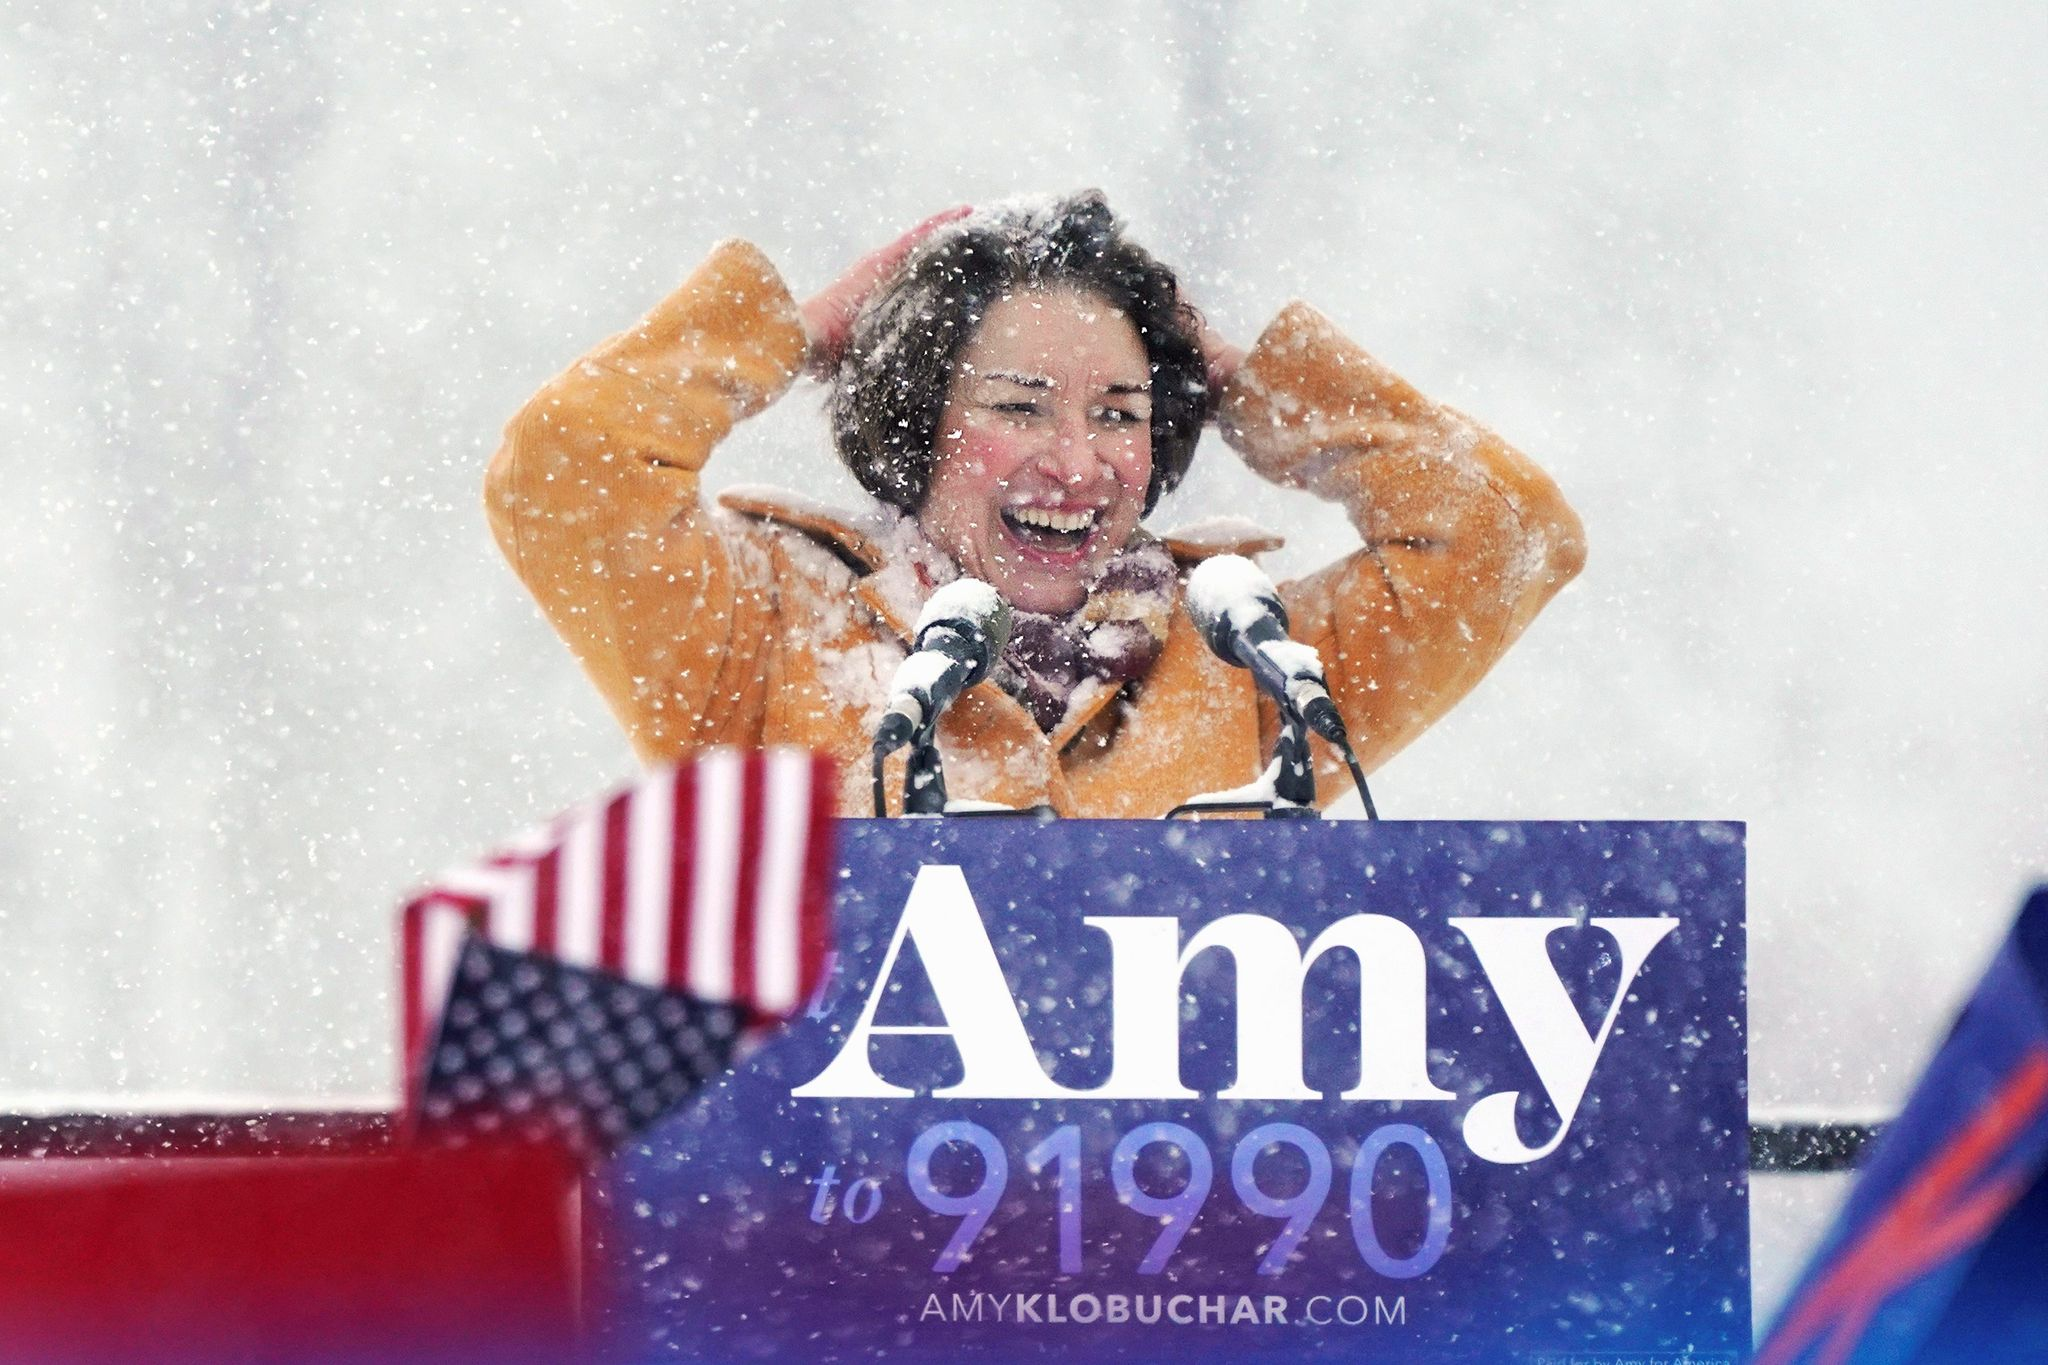 Amy Klobuchar trolls Hillary Clinton with Wisconsin jab